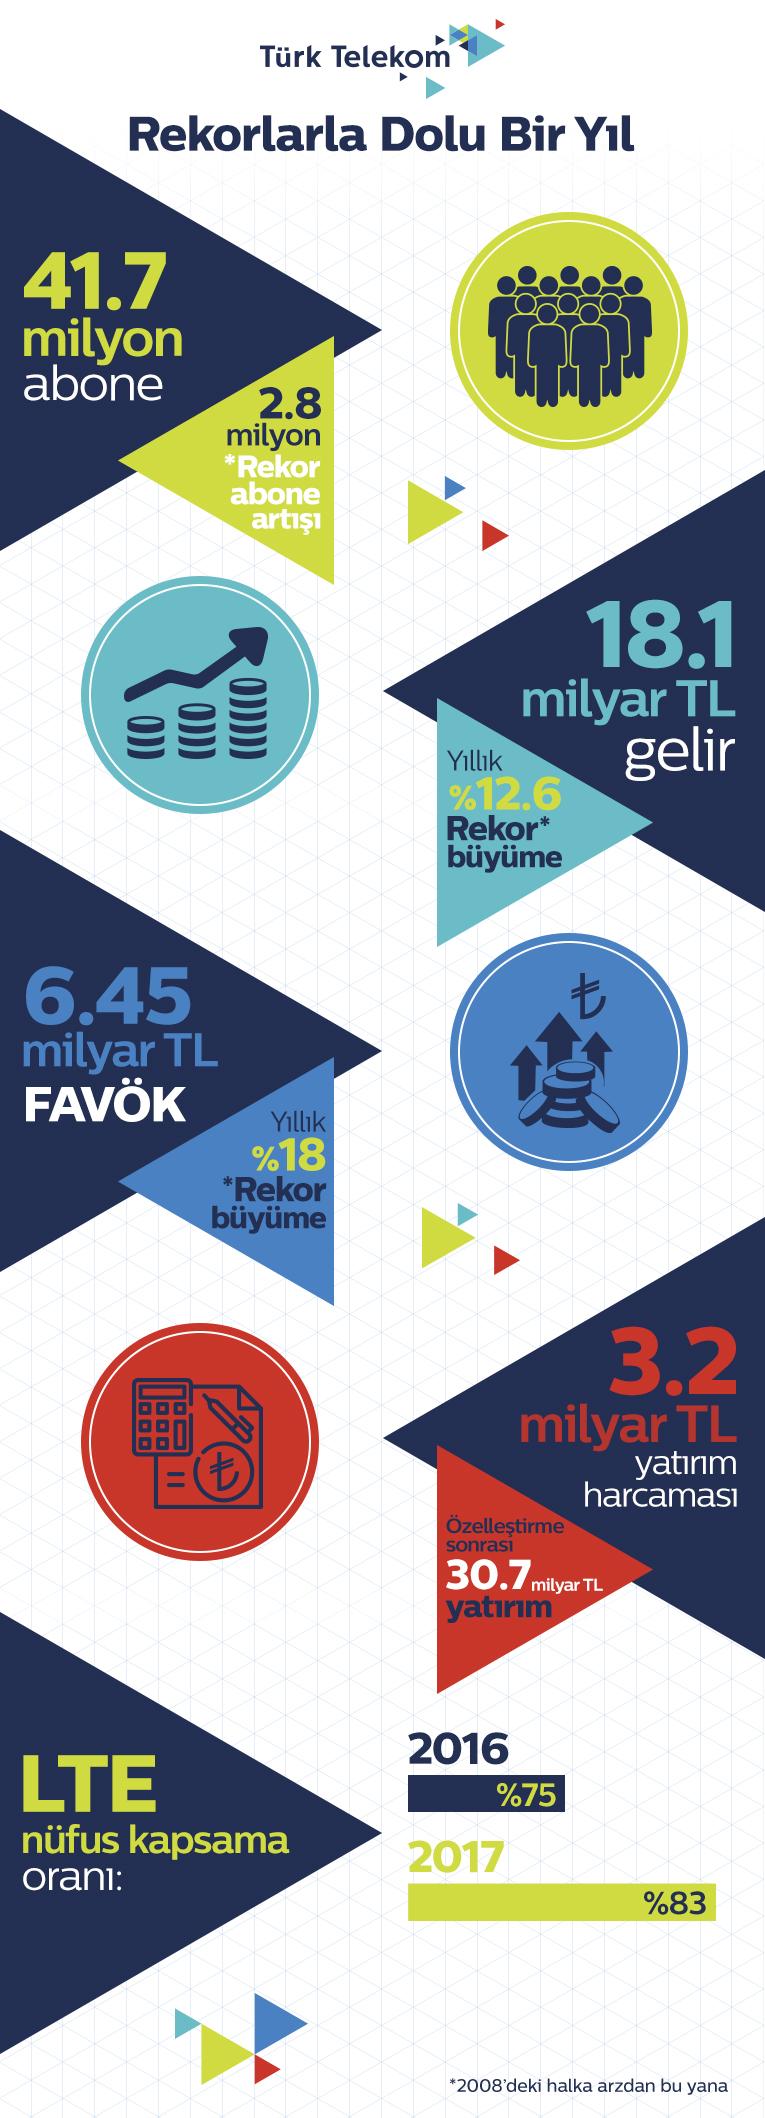 Turk Telekom 2017 finansal sonuclar infografik 2